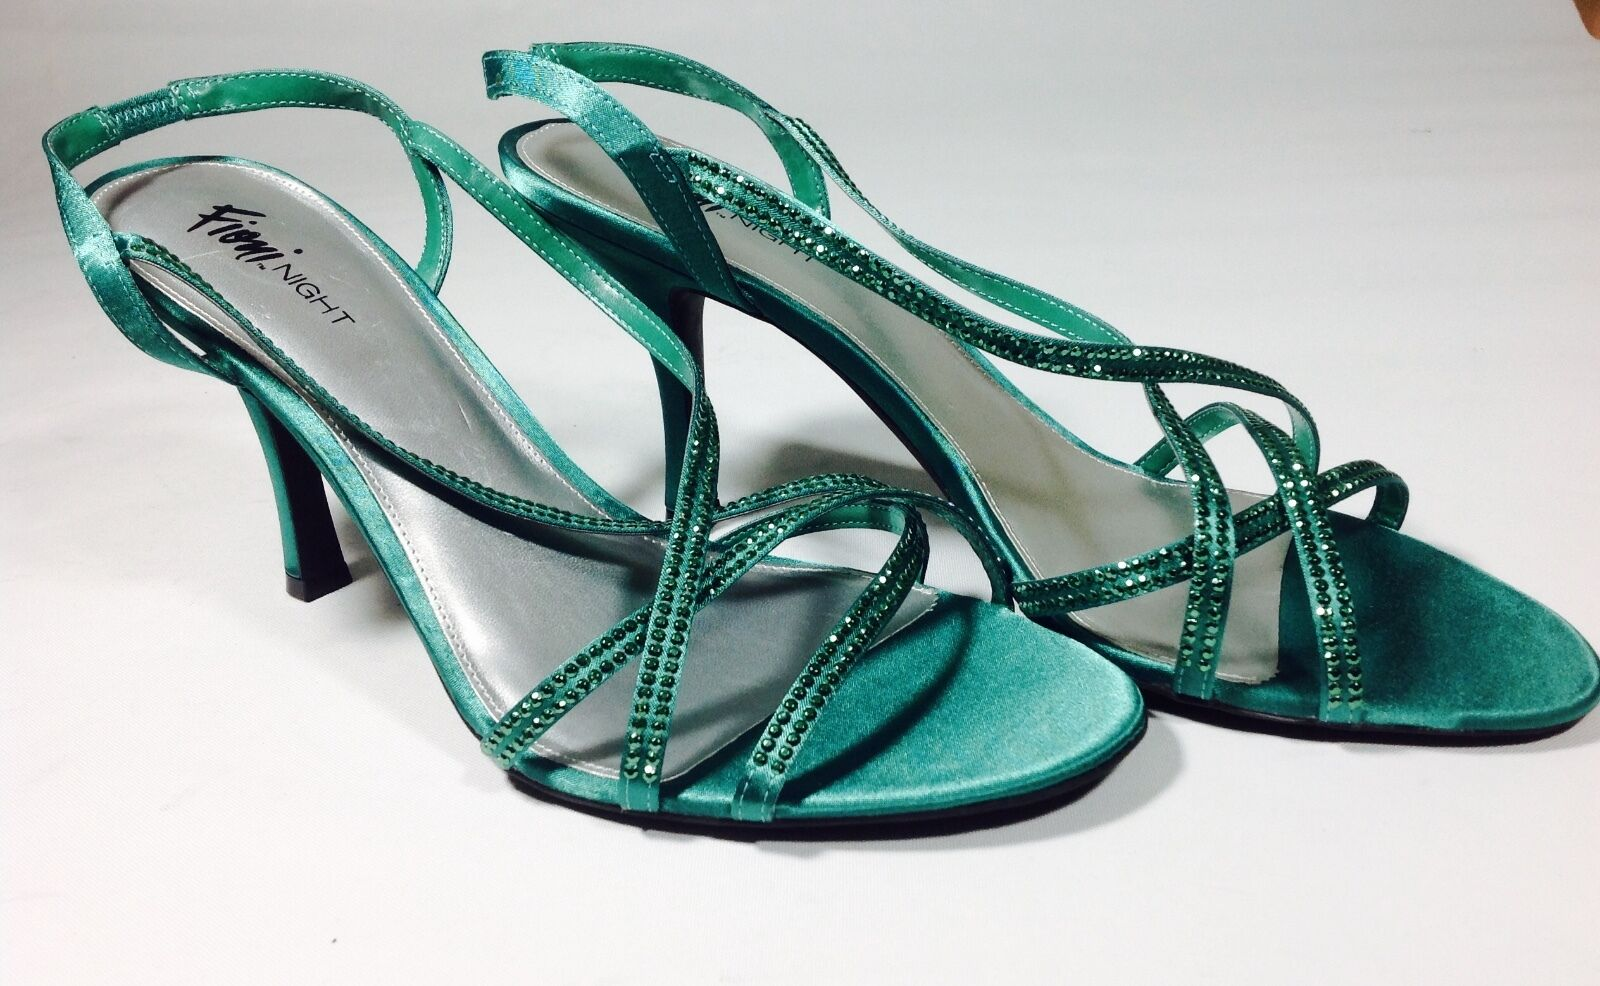 Large Size Women's Green Jewel Heel Shoes Plus Size UK 11 WEDDING REDUCED